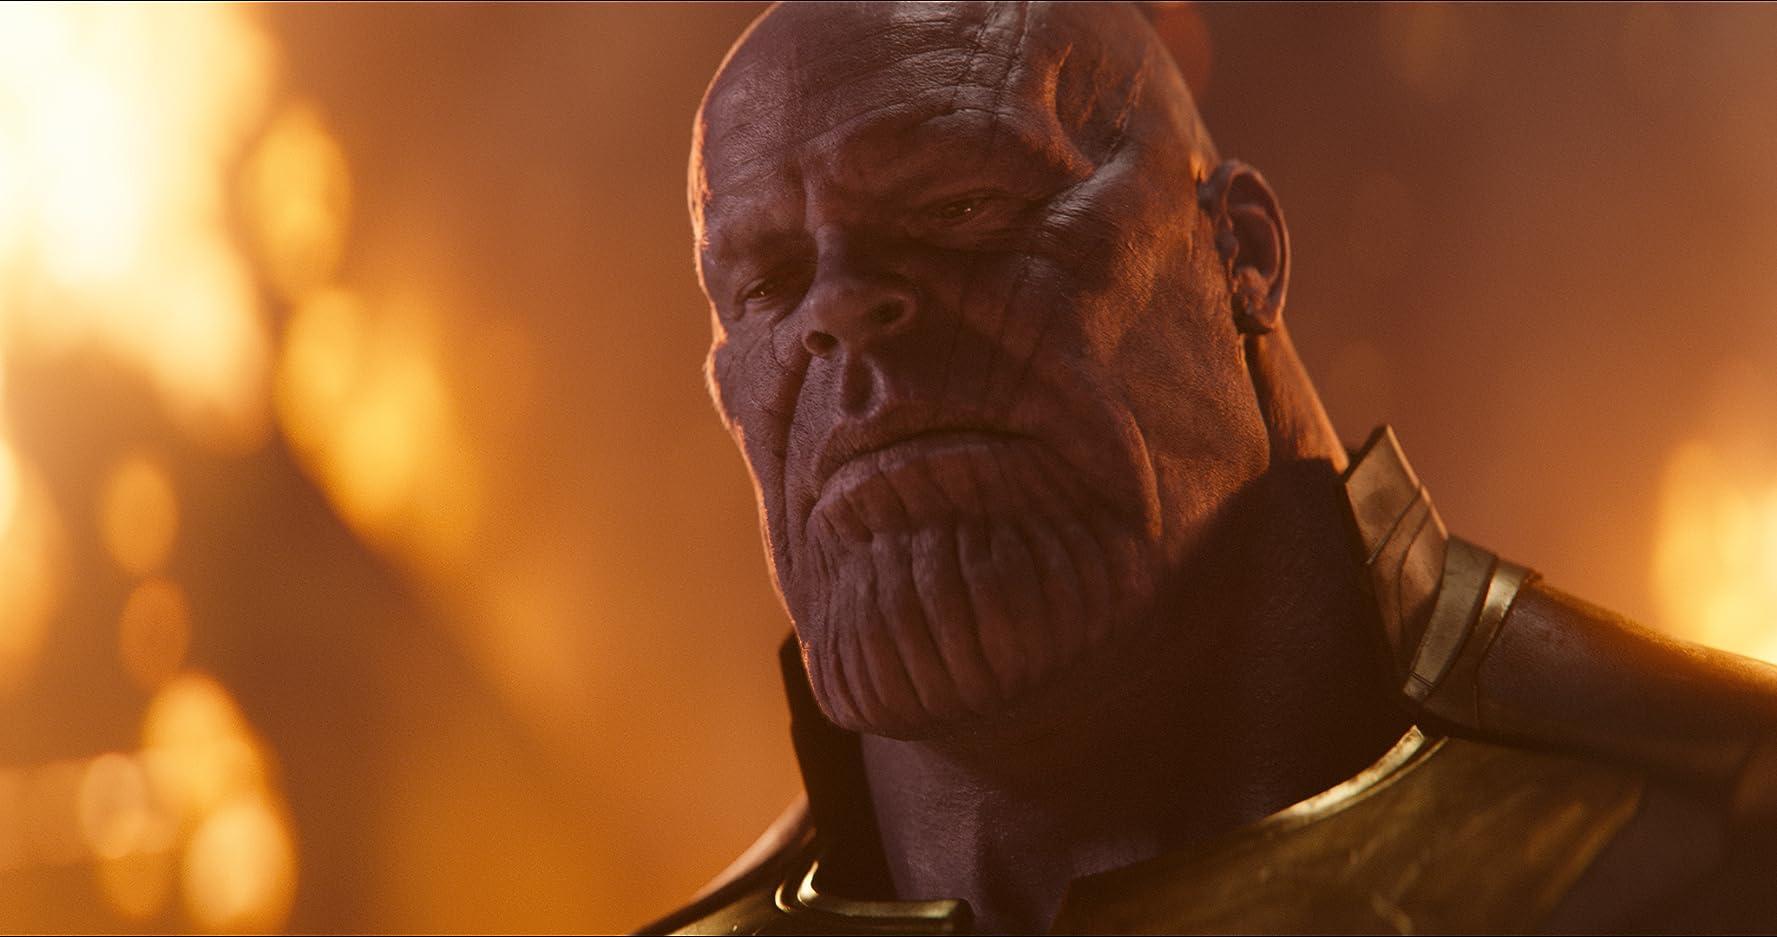 Avengers: Infinity War (2018) / IMDB.com